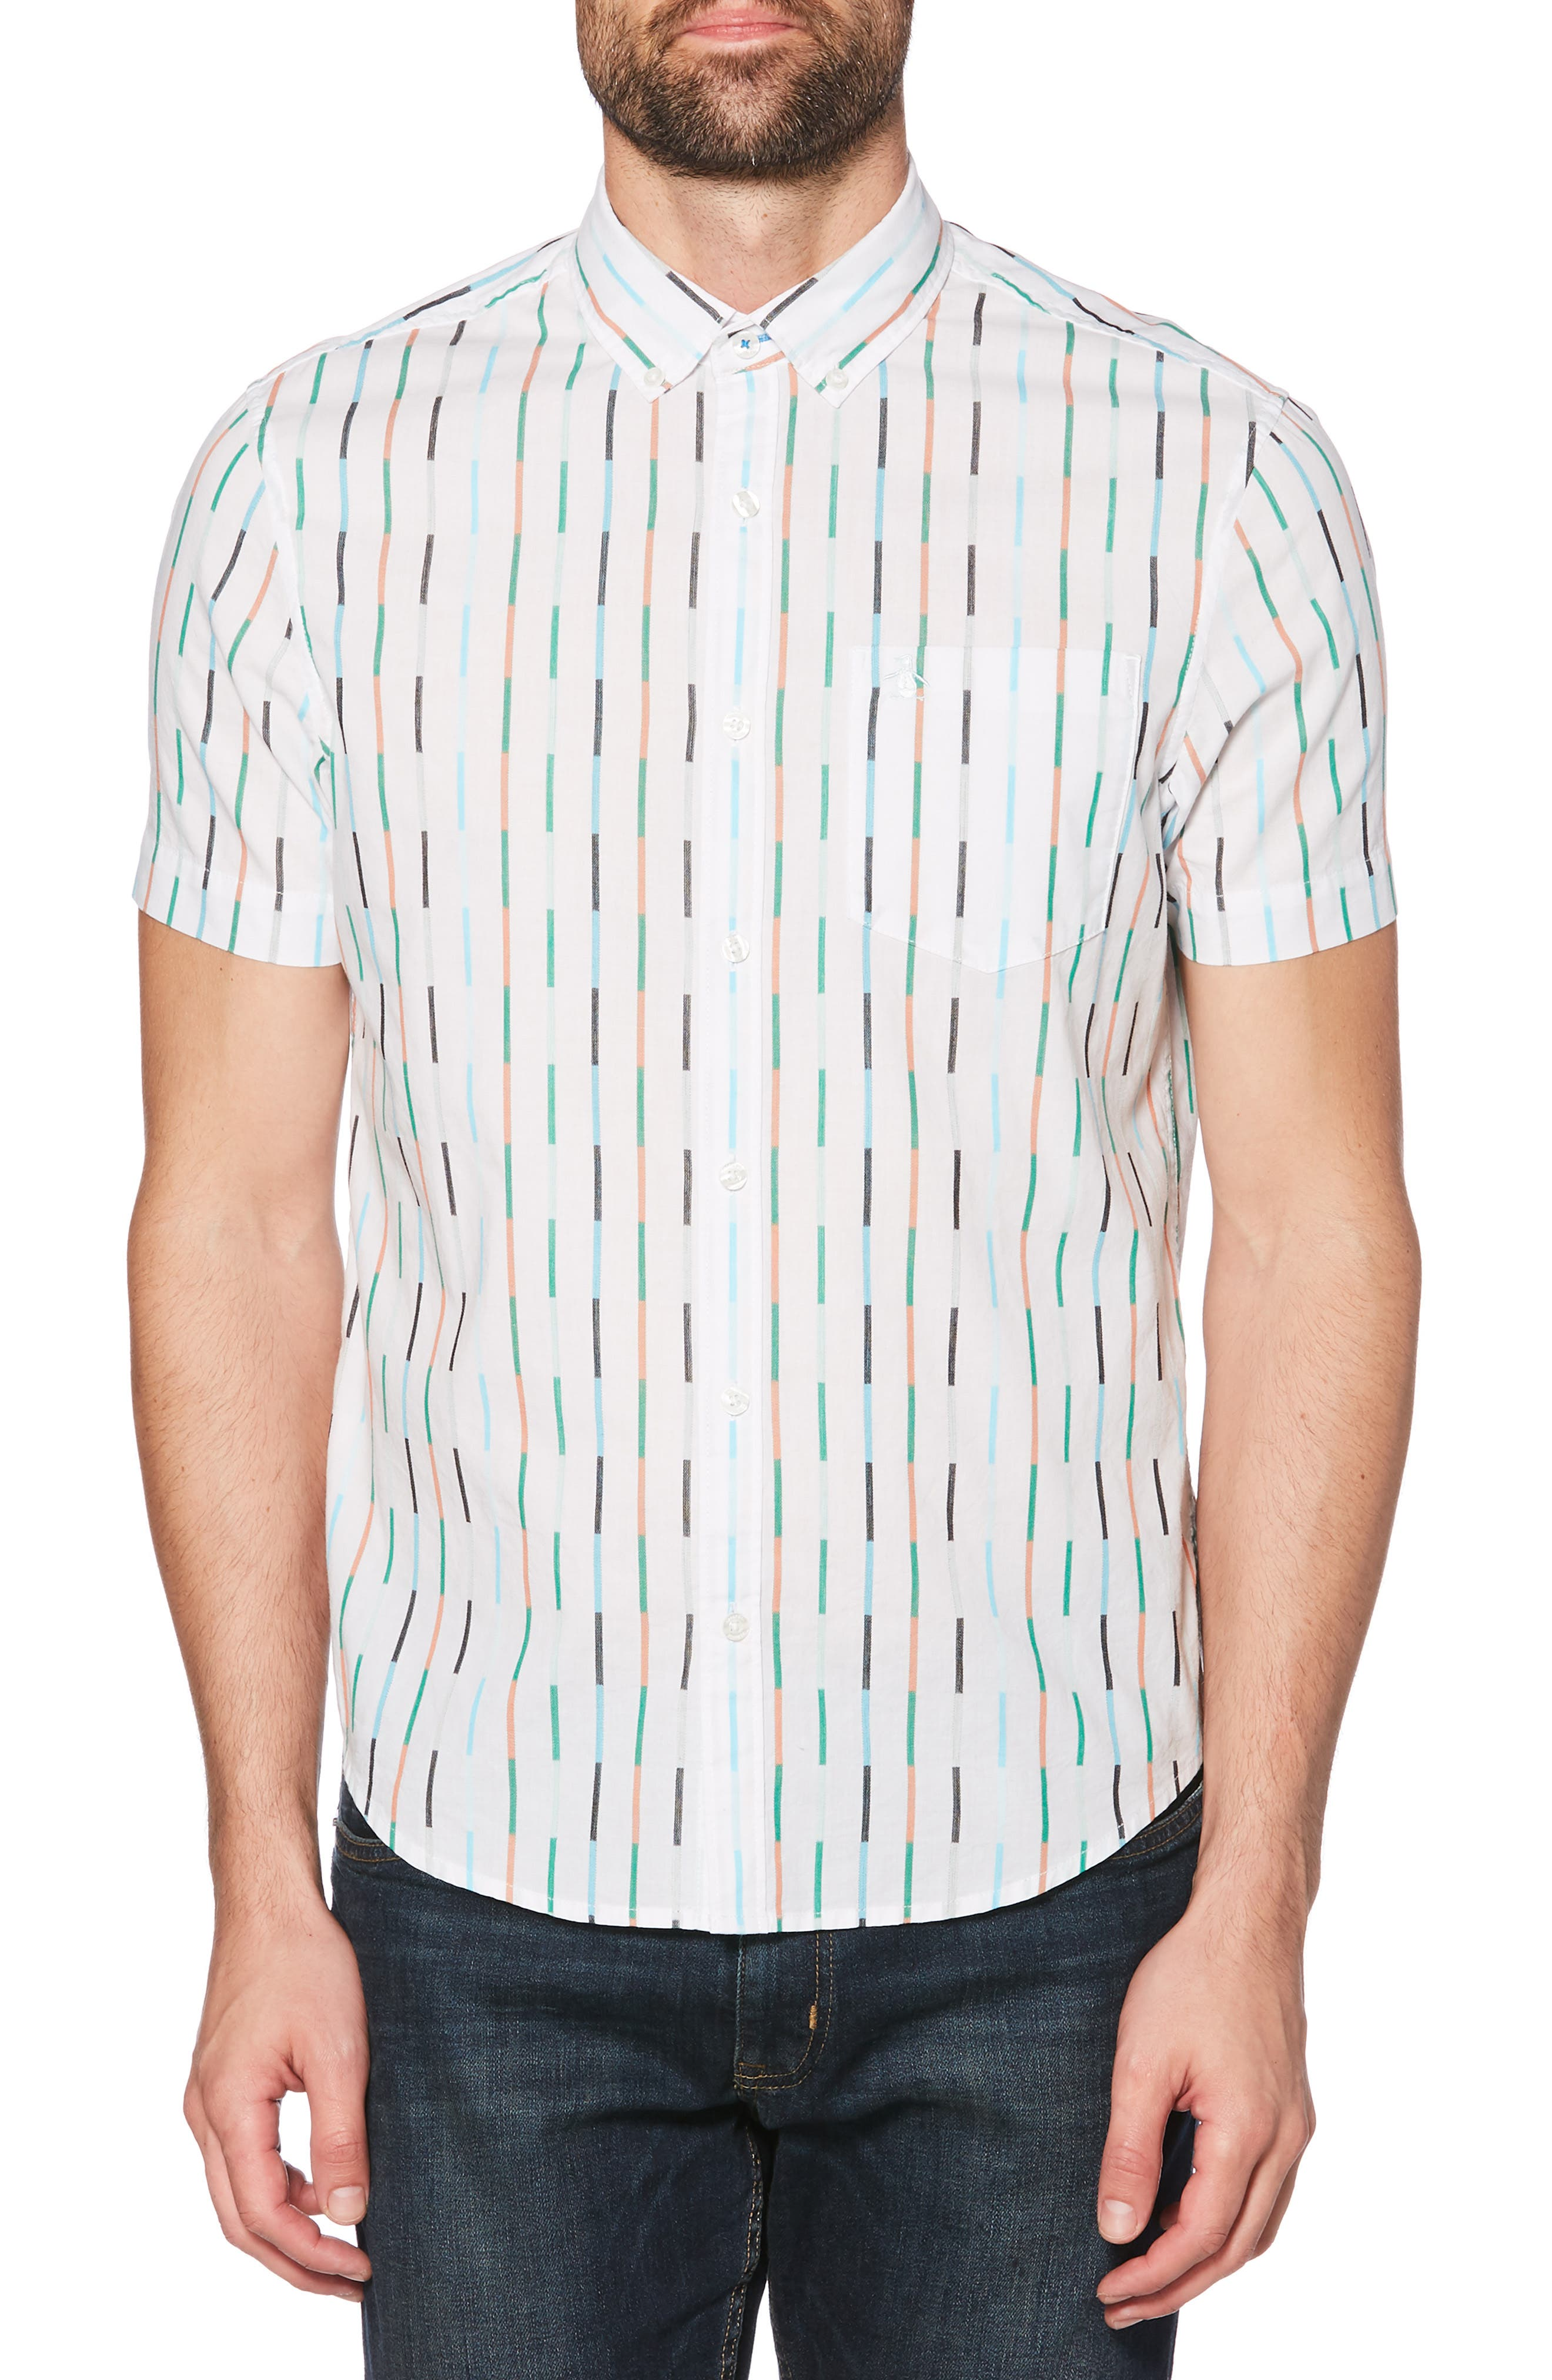 ORIGINAL PENGUIN, Vertical Broken Stripe Woven Shirt, Main thumbnail 1, color, BRIGHT WHITE